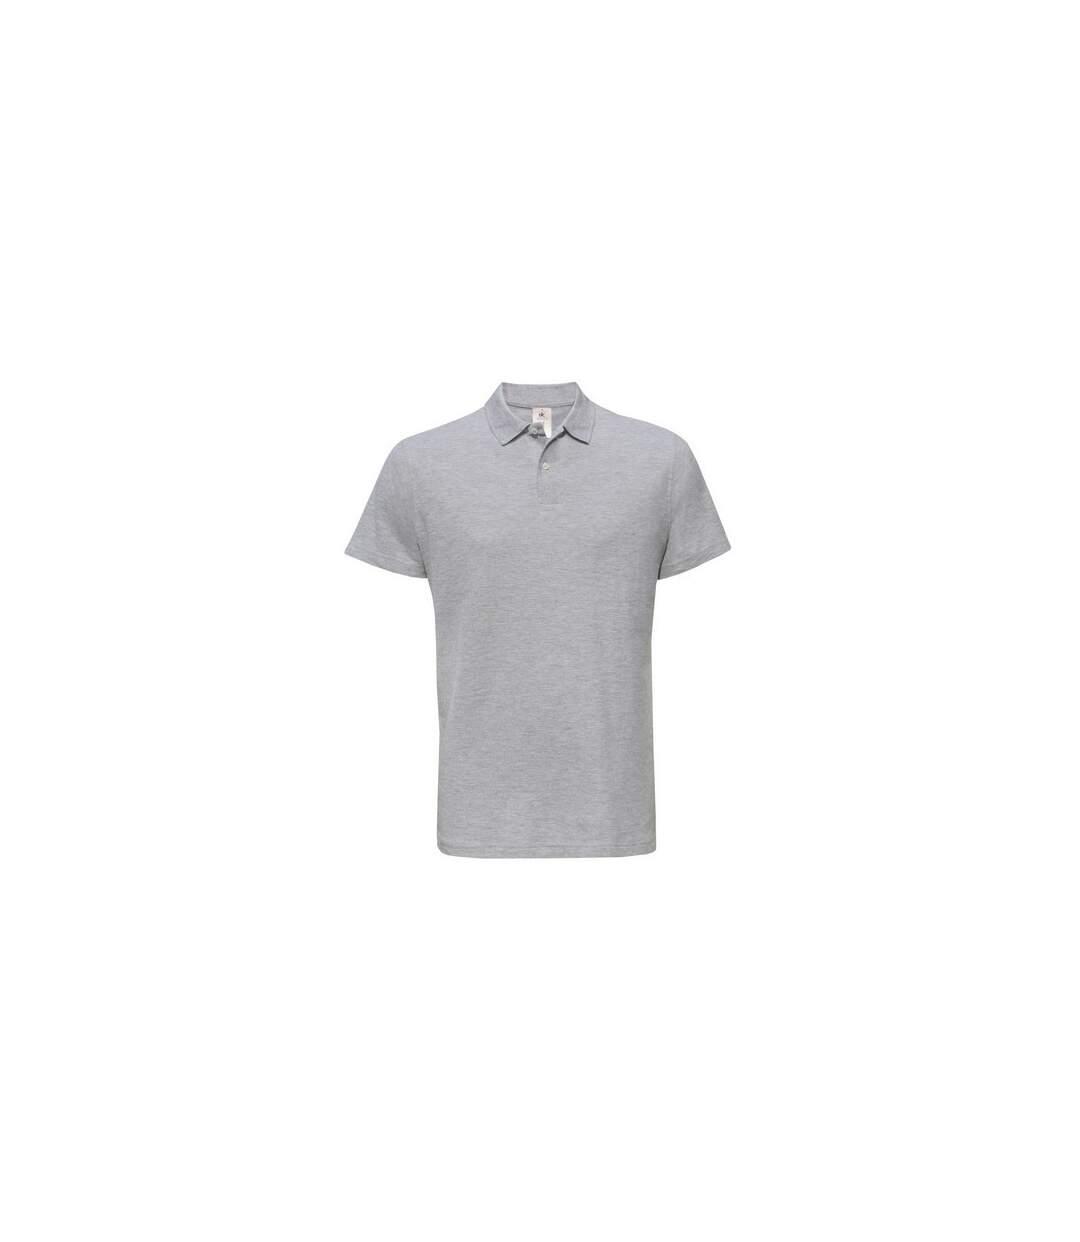 B&C ID.001 Unisex Adults Short Sleeve Polo Shirt (Heather Grey) - UTBC1285